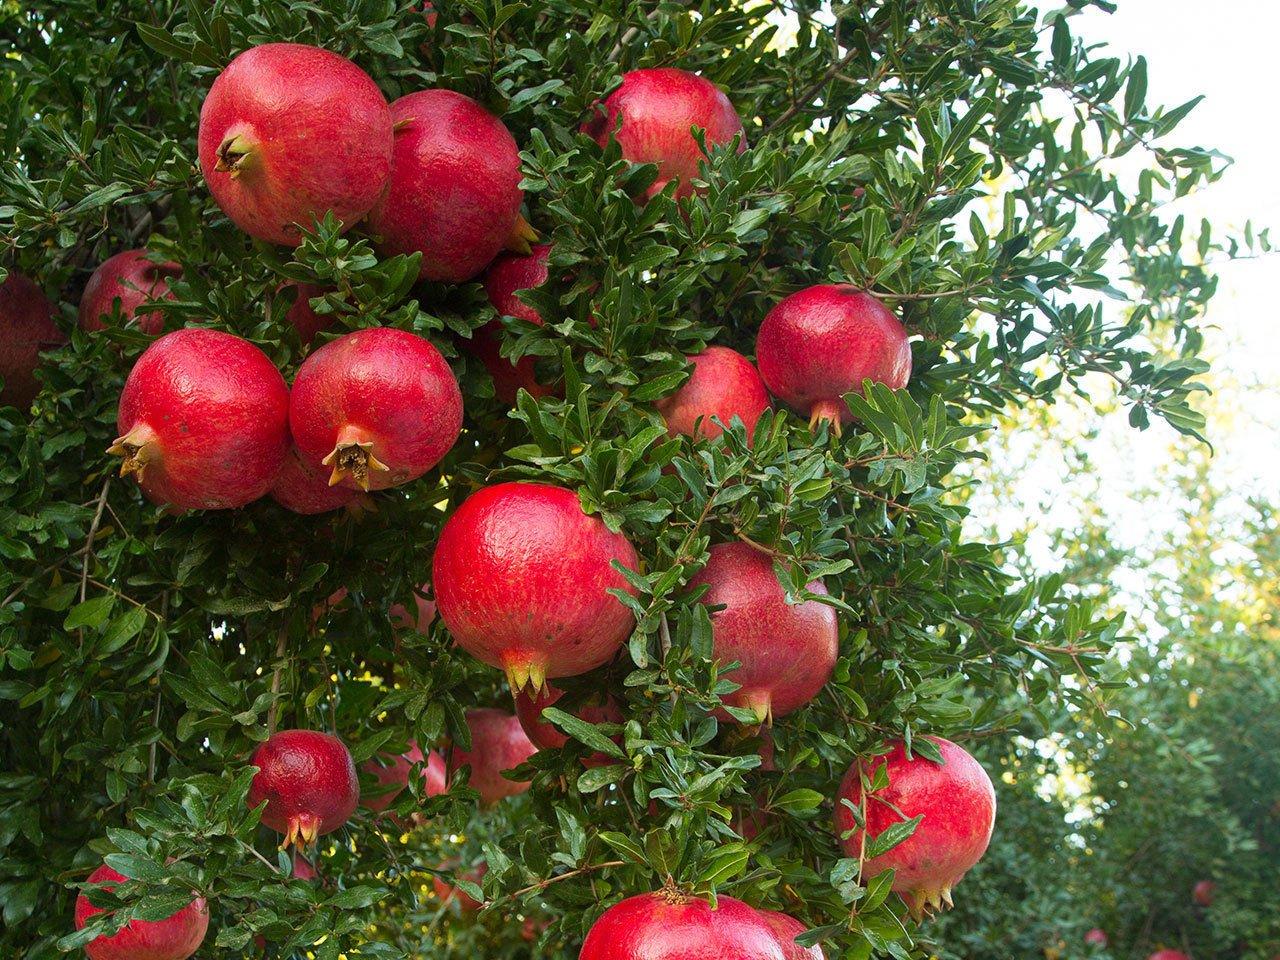 - Domestic Edible Plants